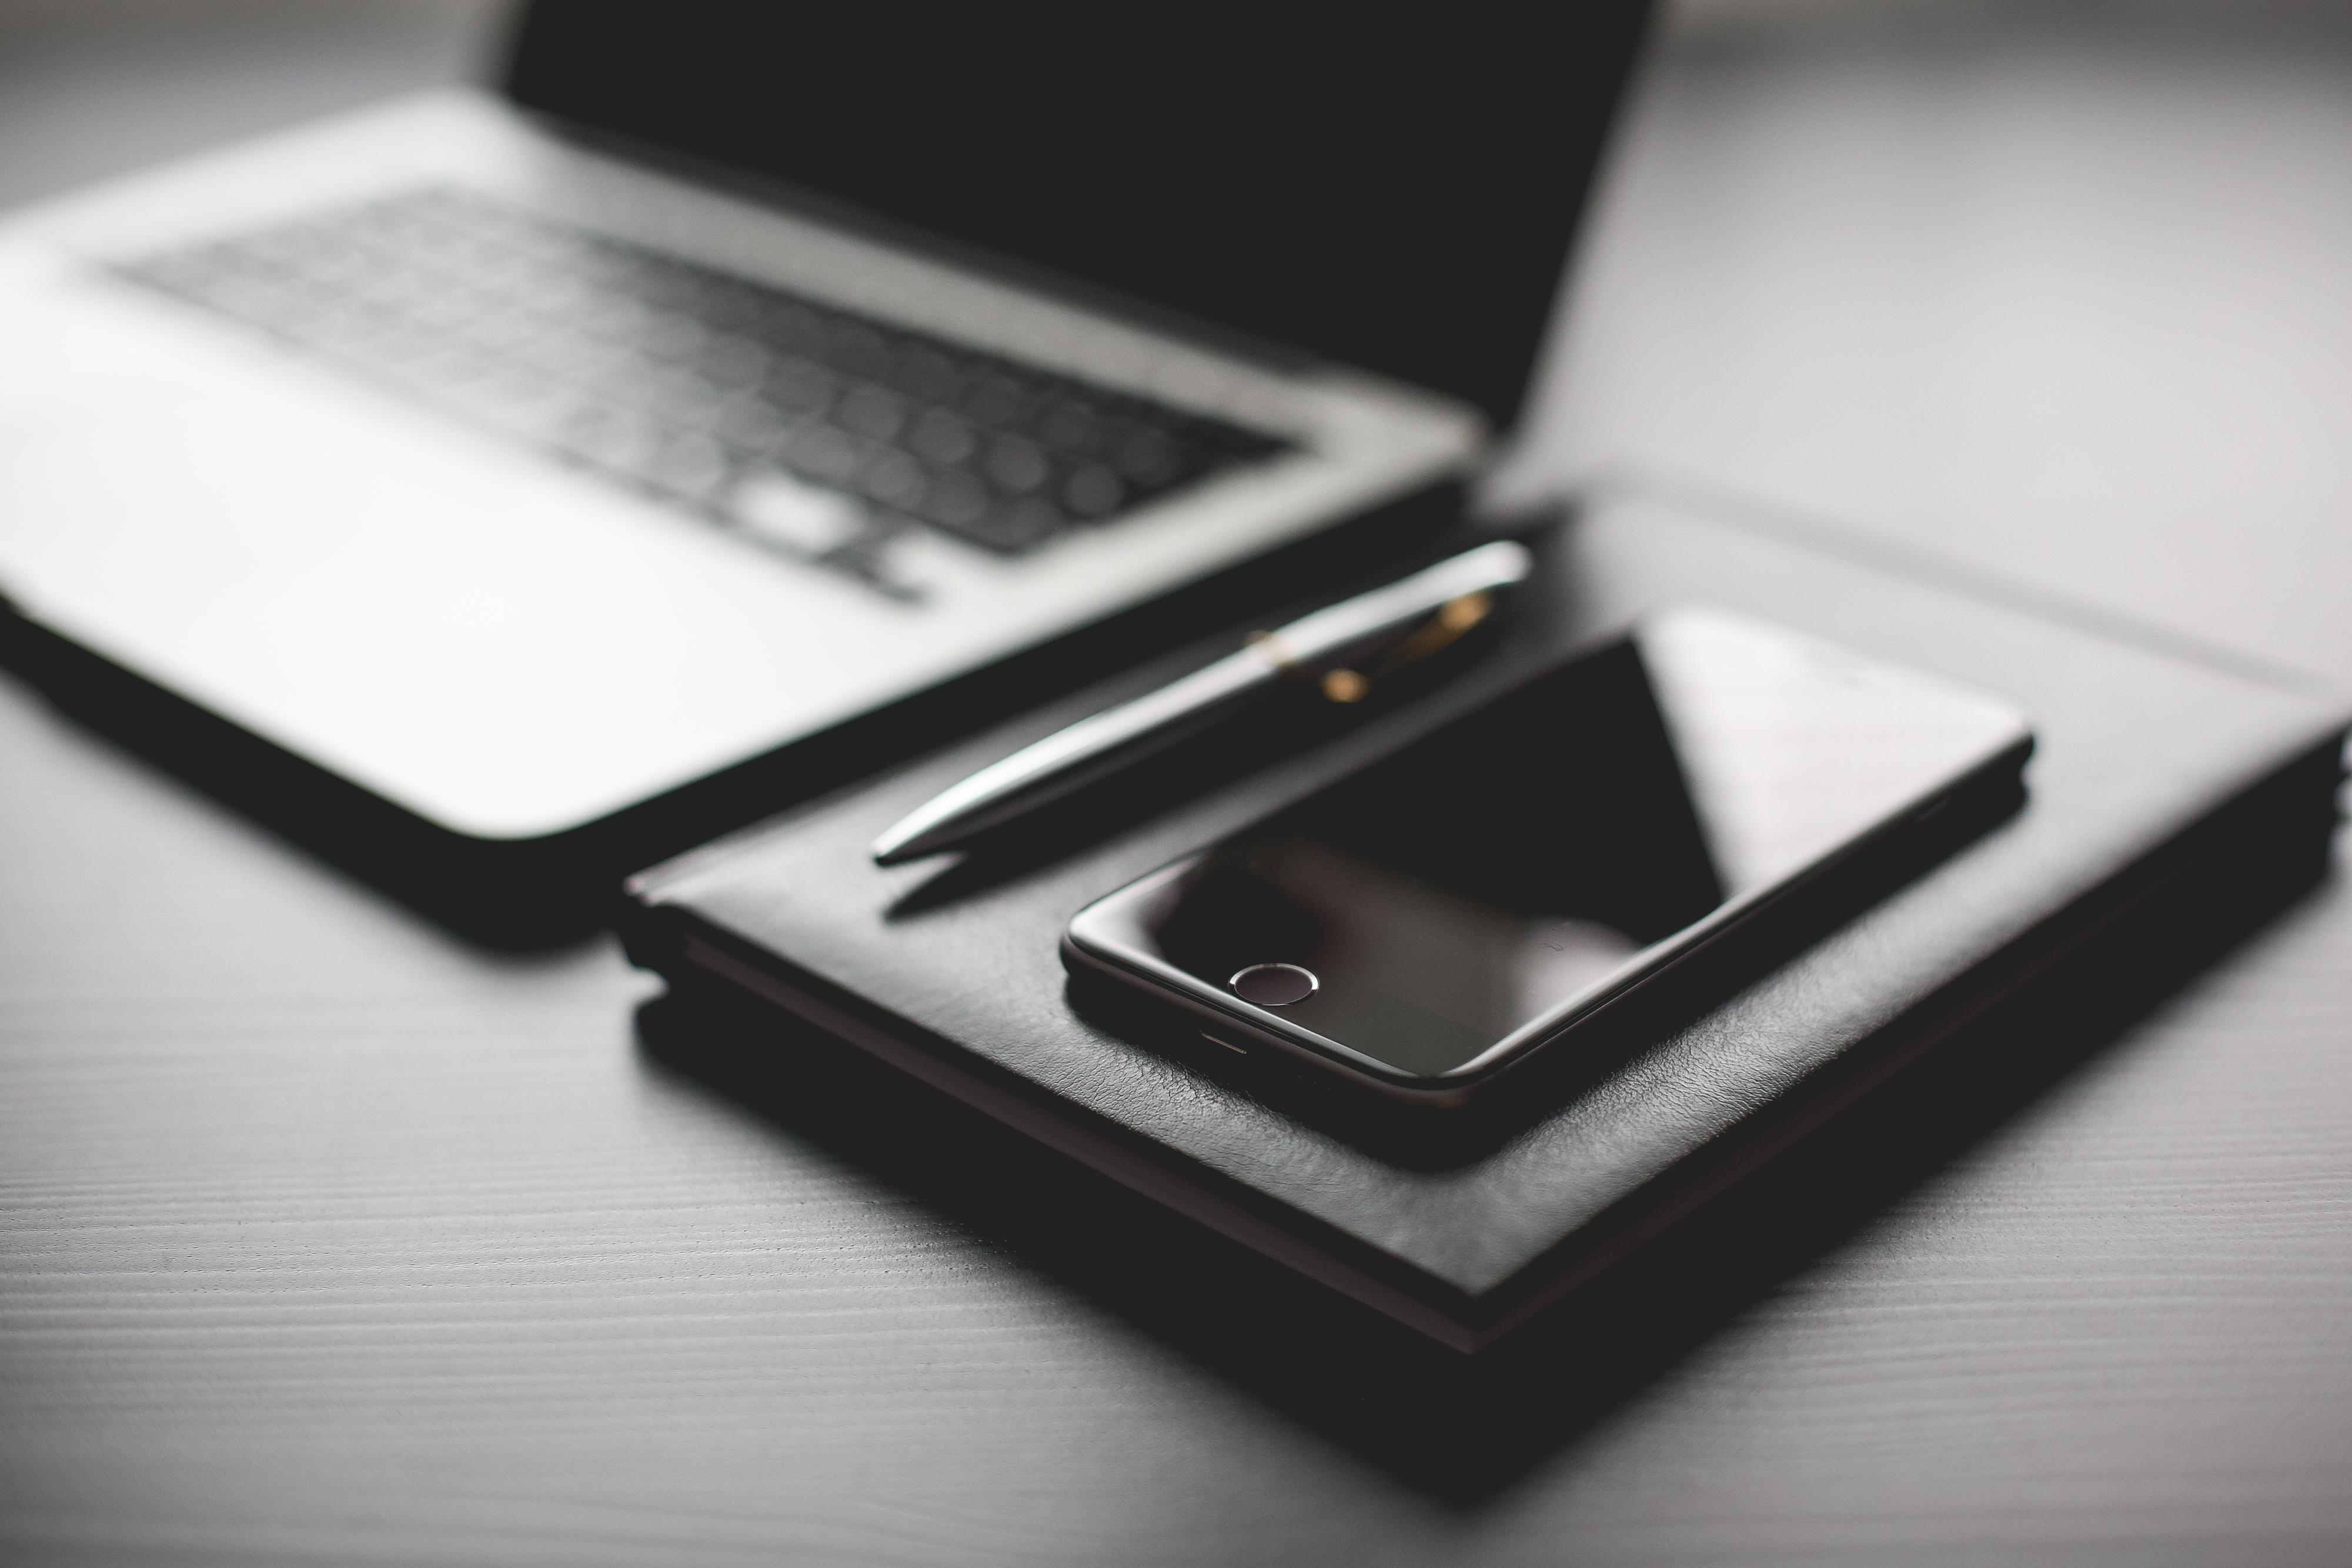 all-black-working-setup-diary-and-iphone-picjumbo-com-1